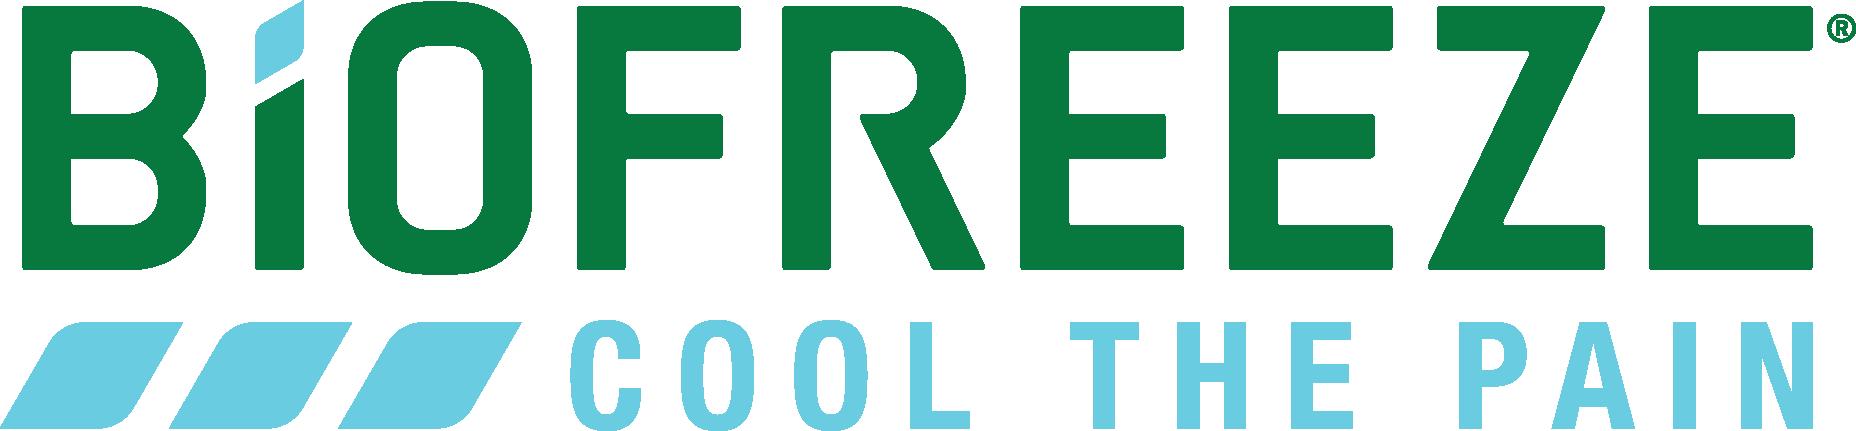 Biofreeze Image